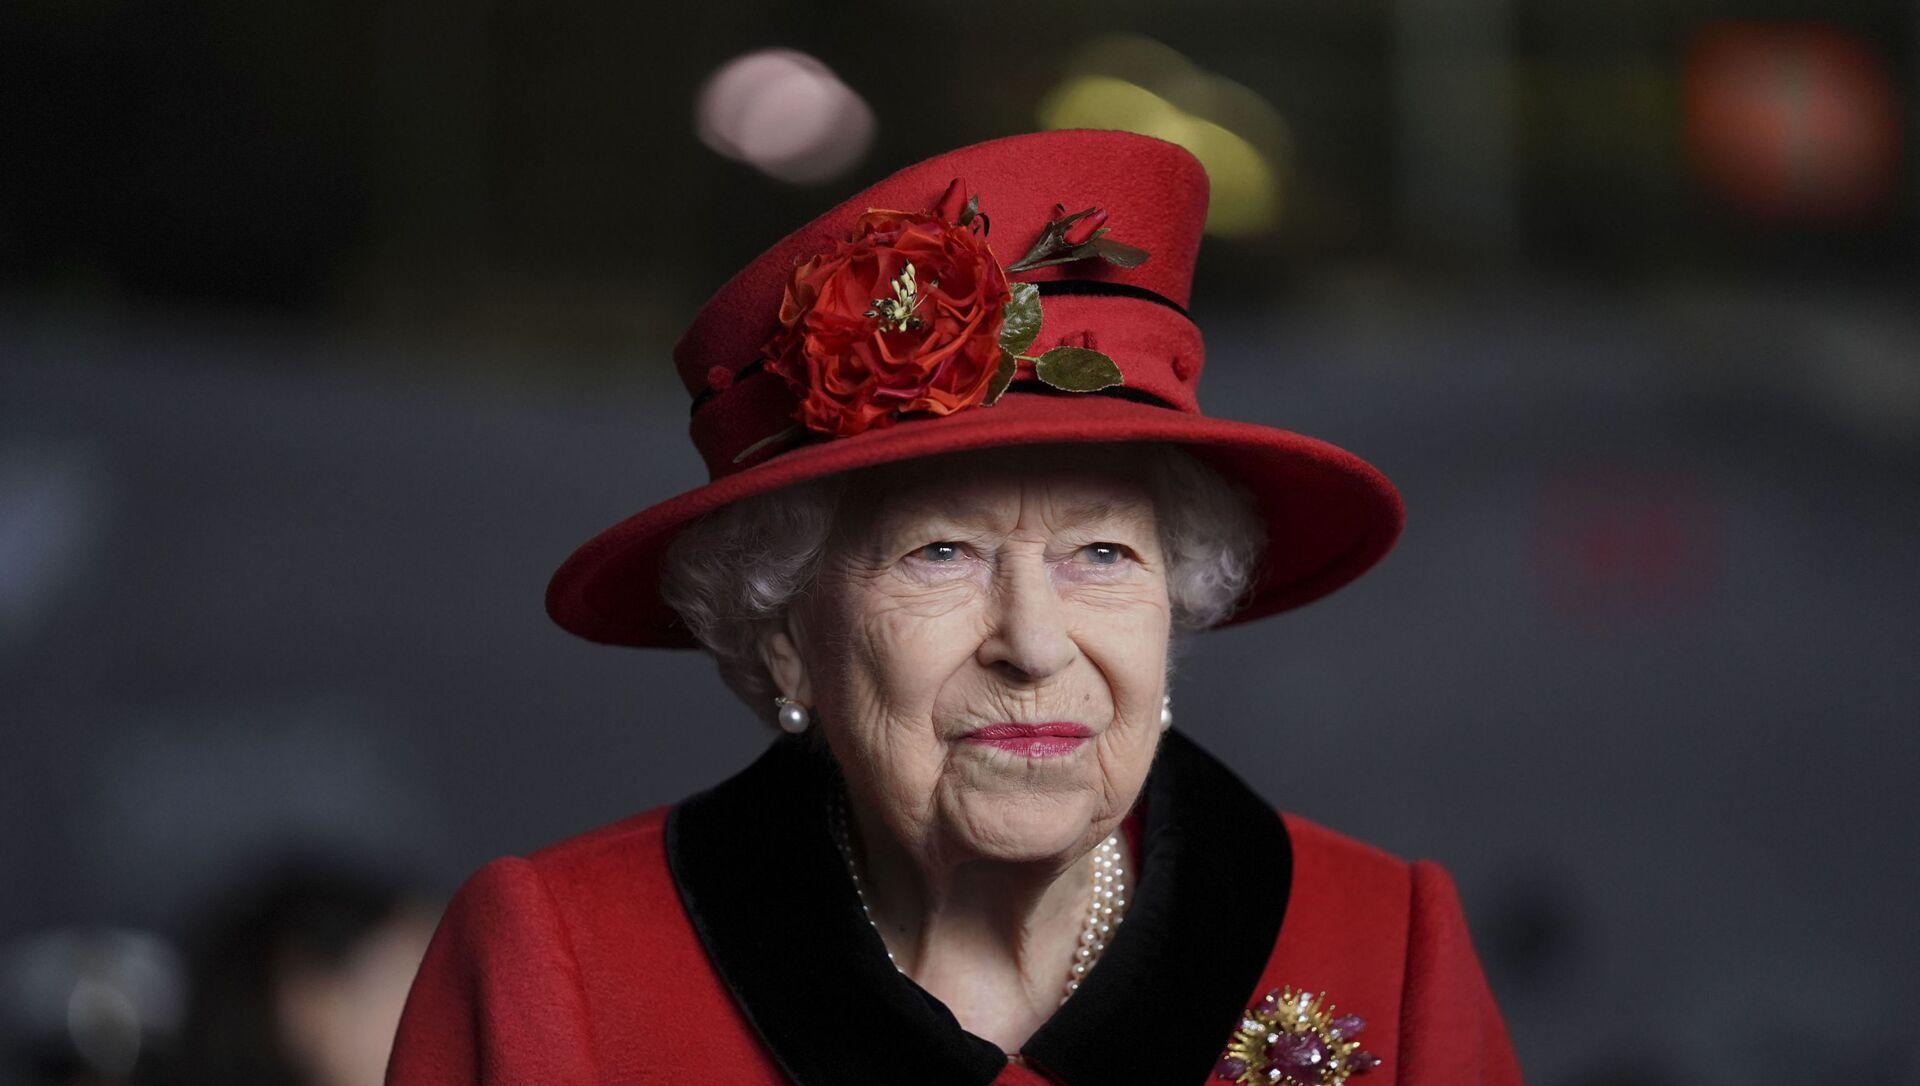 Королева Великобритании Елизавета II, фото из архива - Sputnik Азербайджан, 1920, 09.09.2021